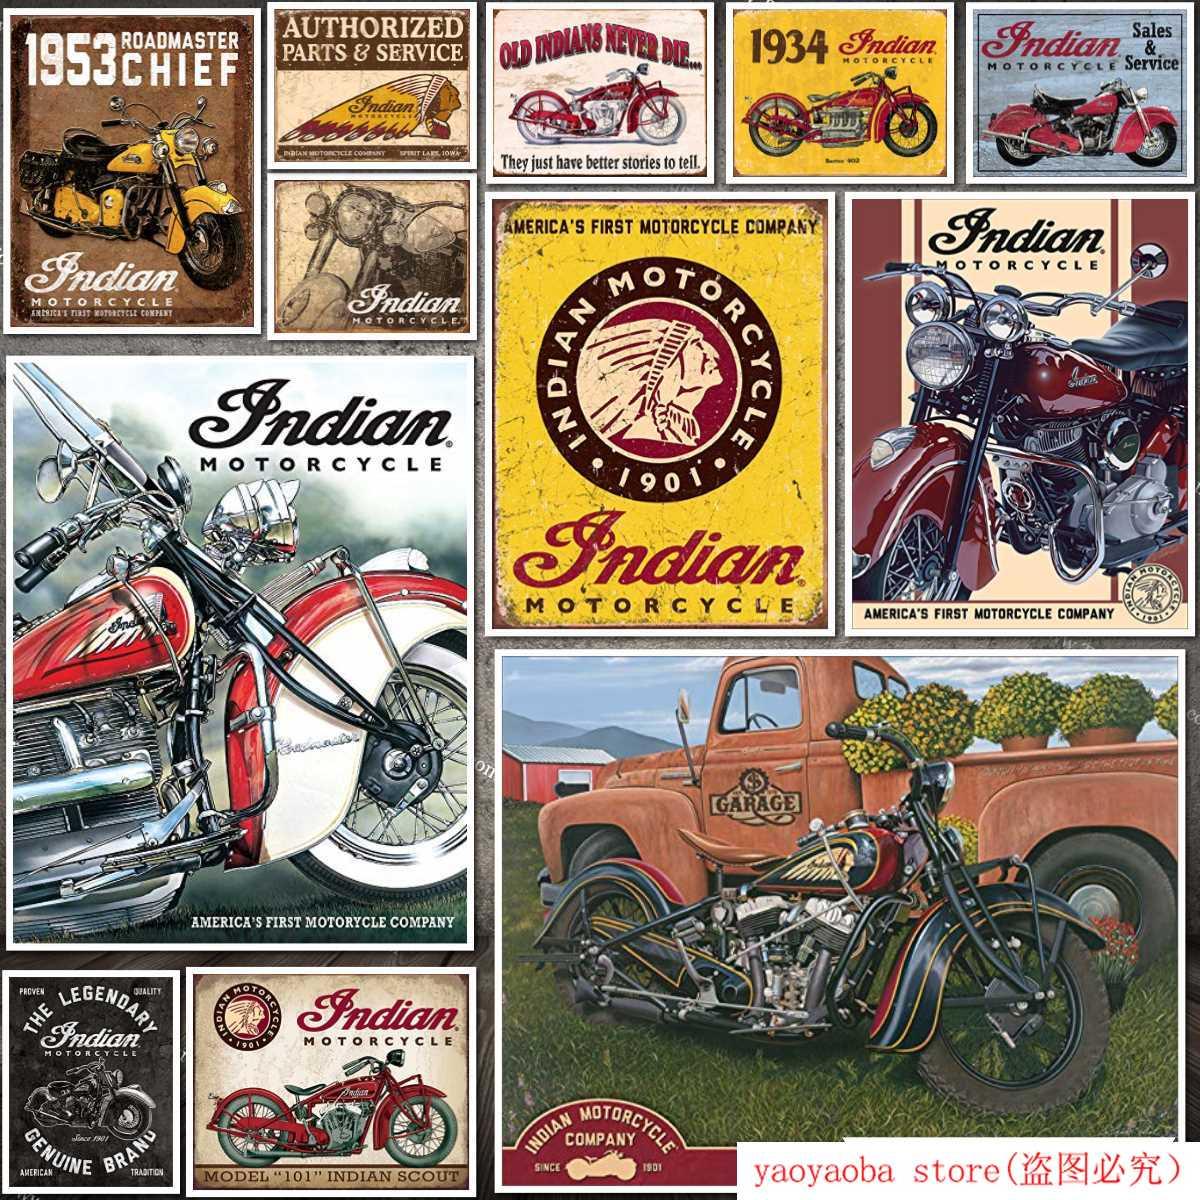 Letrero metálico pintura de estaño para motocicleta india de empresas desconocidas desde 1901, cartel decorativo para pared, cartel de lata Retro para bares y bares